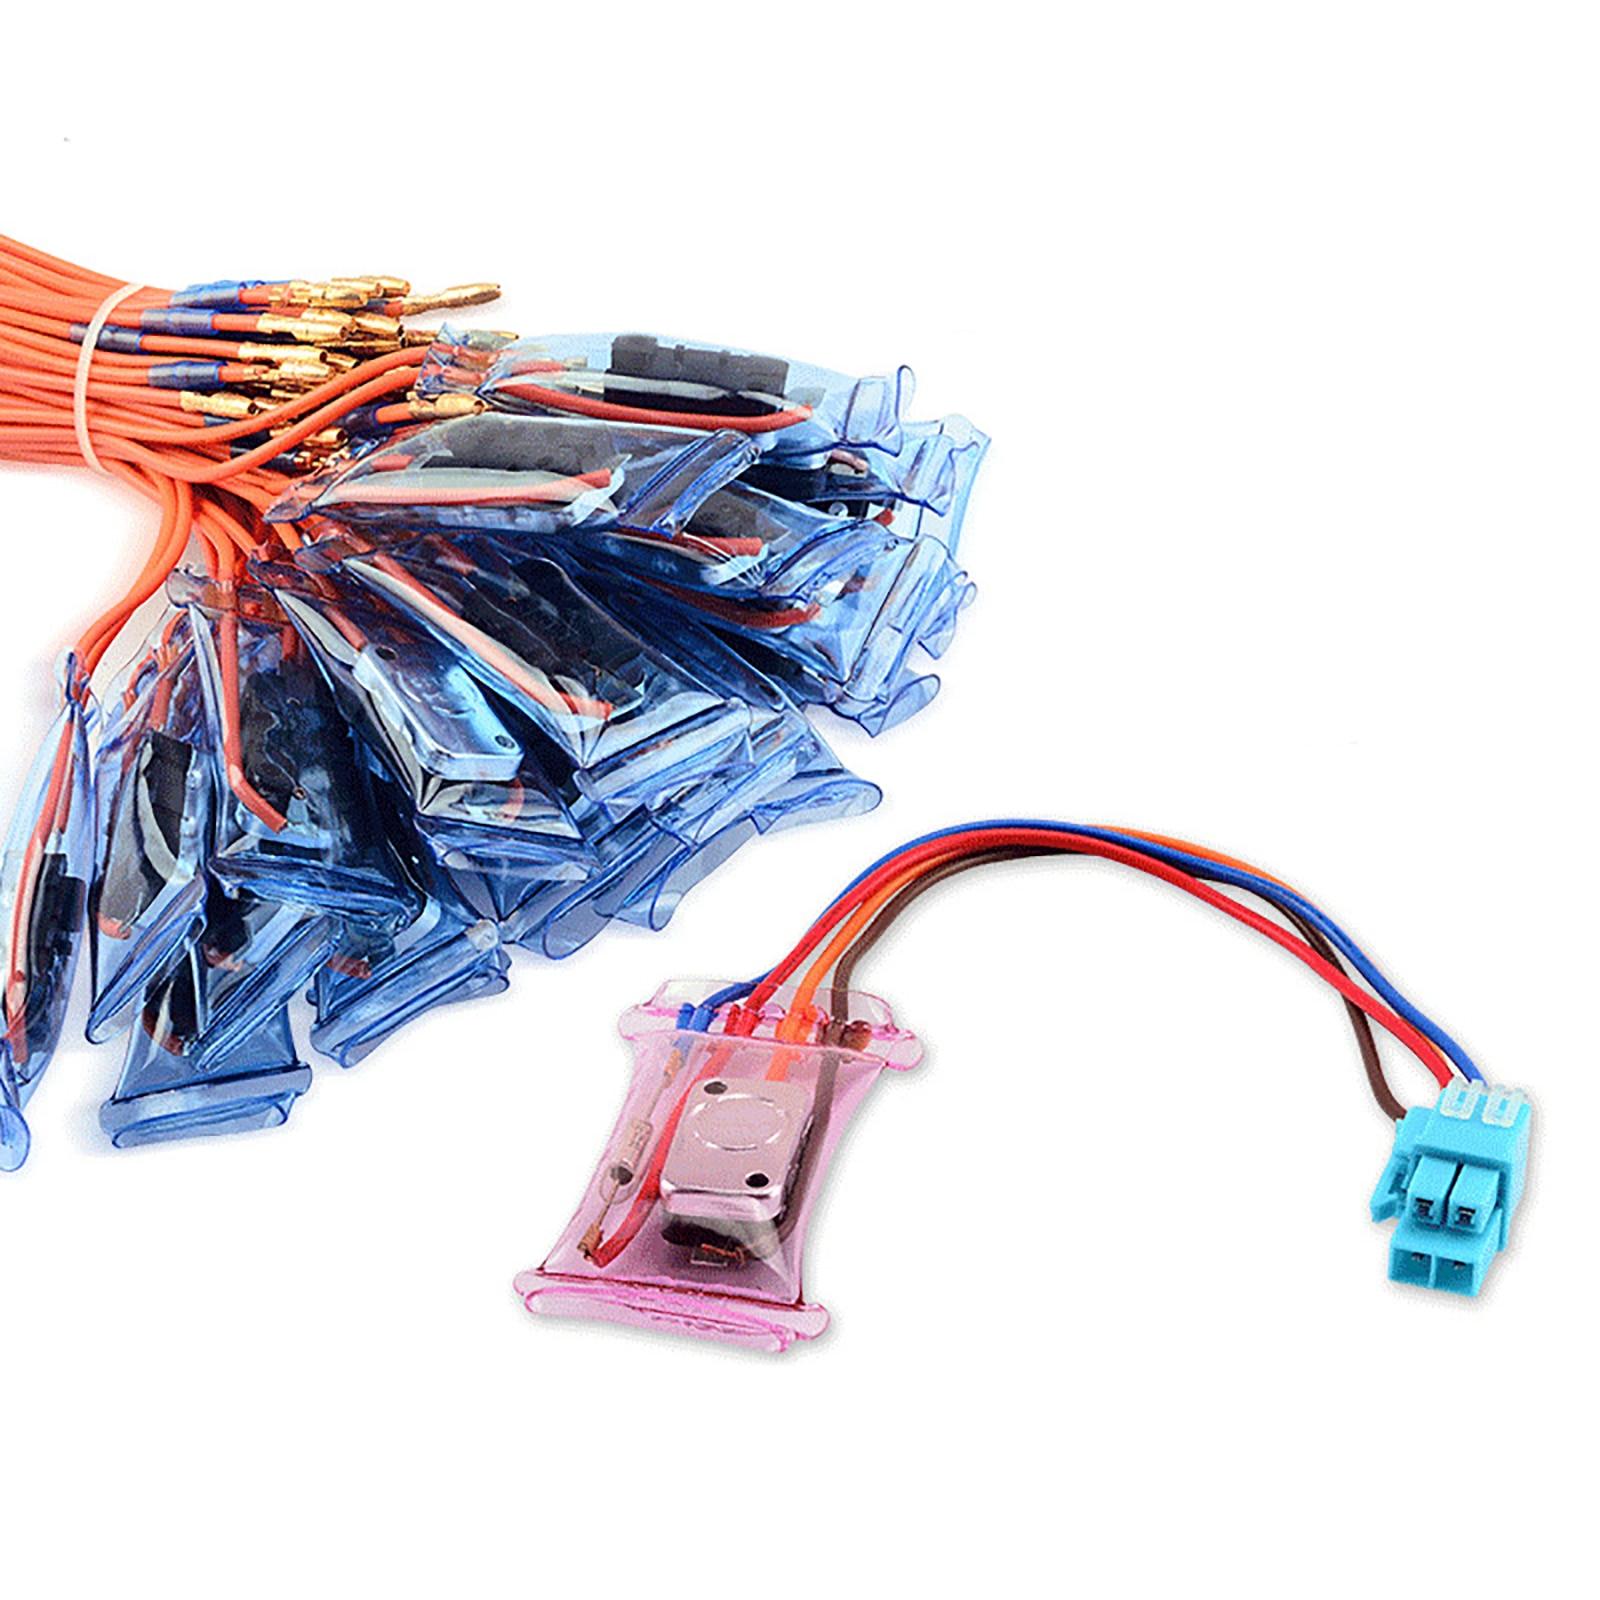 N12 5 Grad 3 Kabel Kühlschrank Defroster Thermostat Ac 250v 10a 7 Celsius Bimetall Kühlschränke Abtauung Thermostator Zubehör Refrigerator Parts Aliexpress